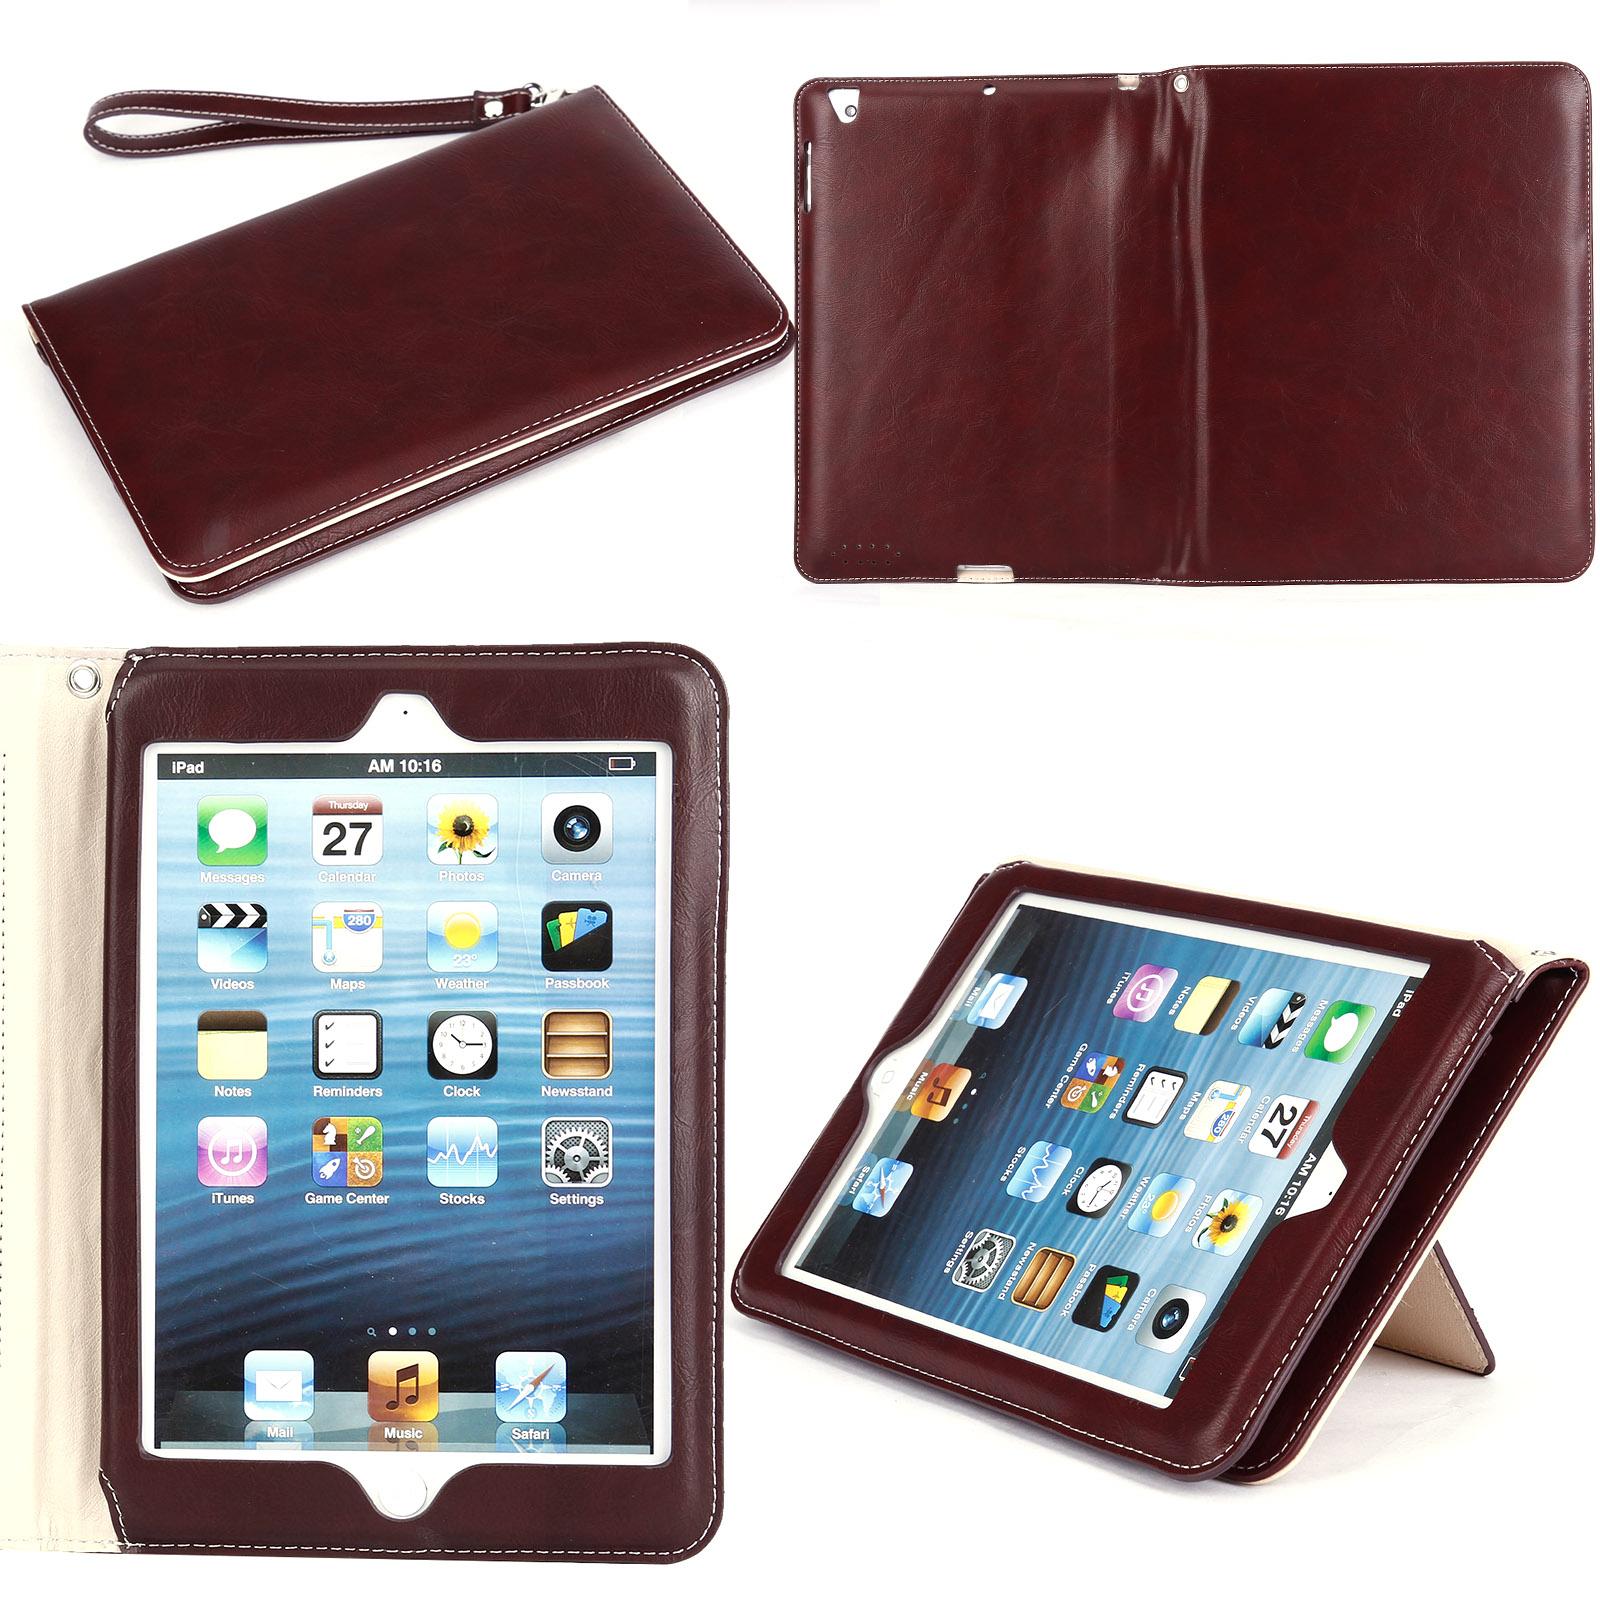 housse etui couverture pochette pour ipad mini 1 2 3 ipad pro 9 7 ipad air 2 ebay. Black Bedroom Furniture Sets. Home Design Ideas